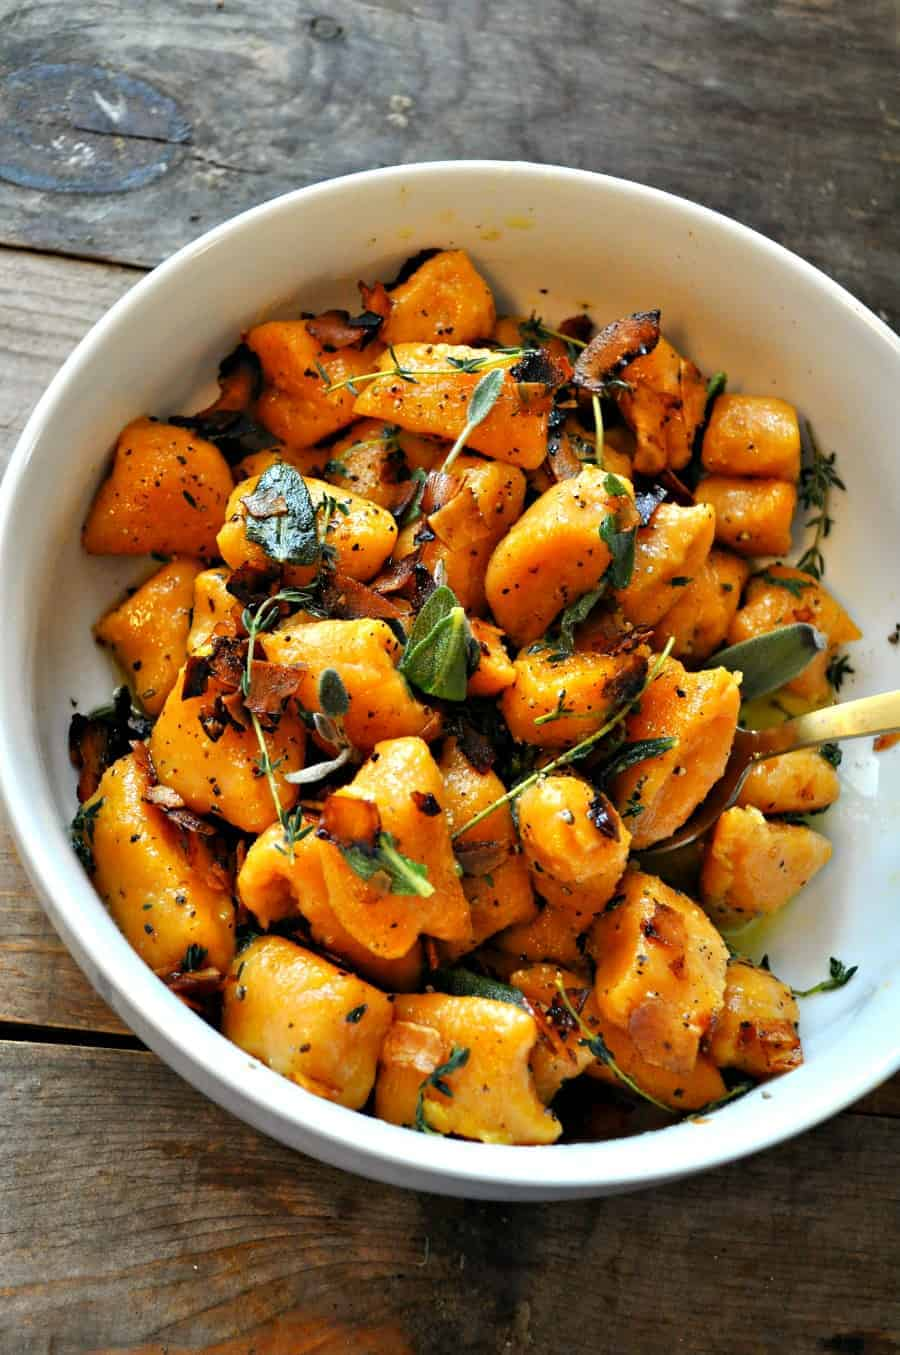 How to prepare sweet potato gnocchi